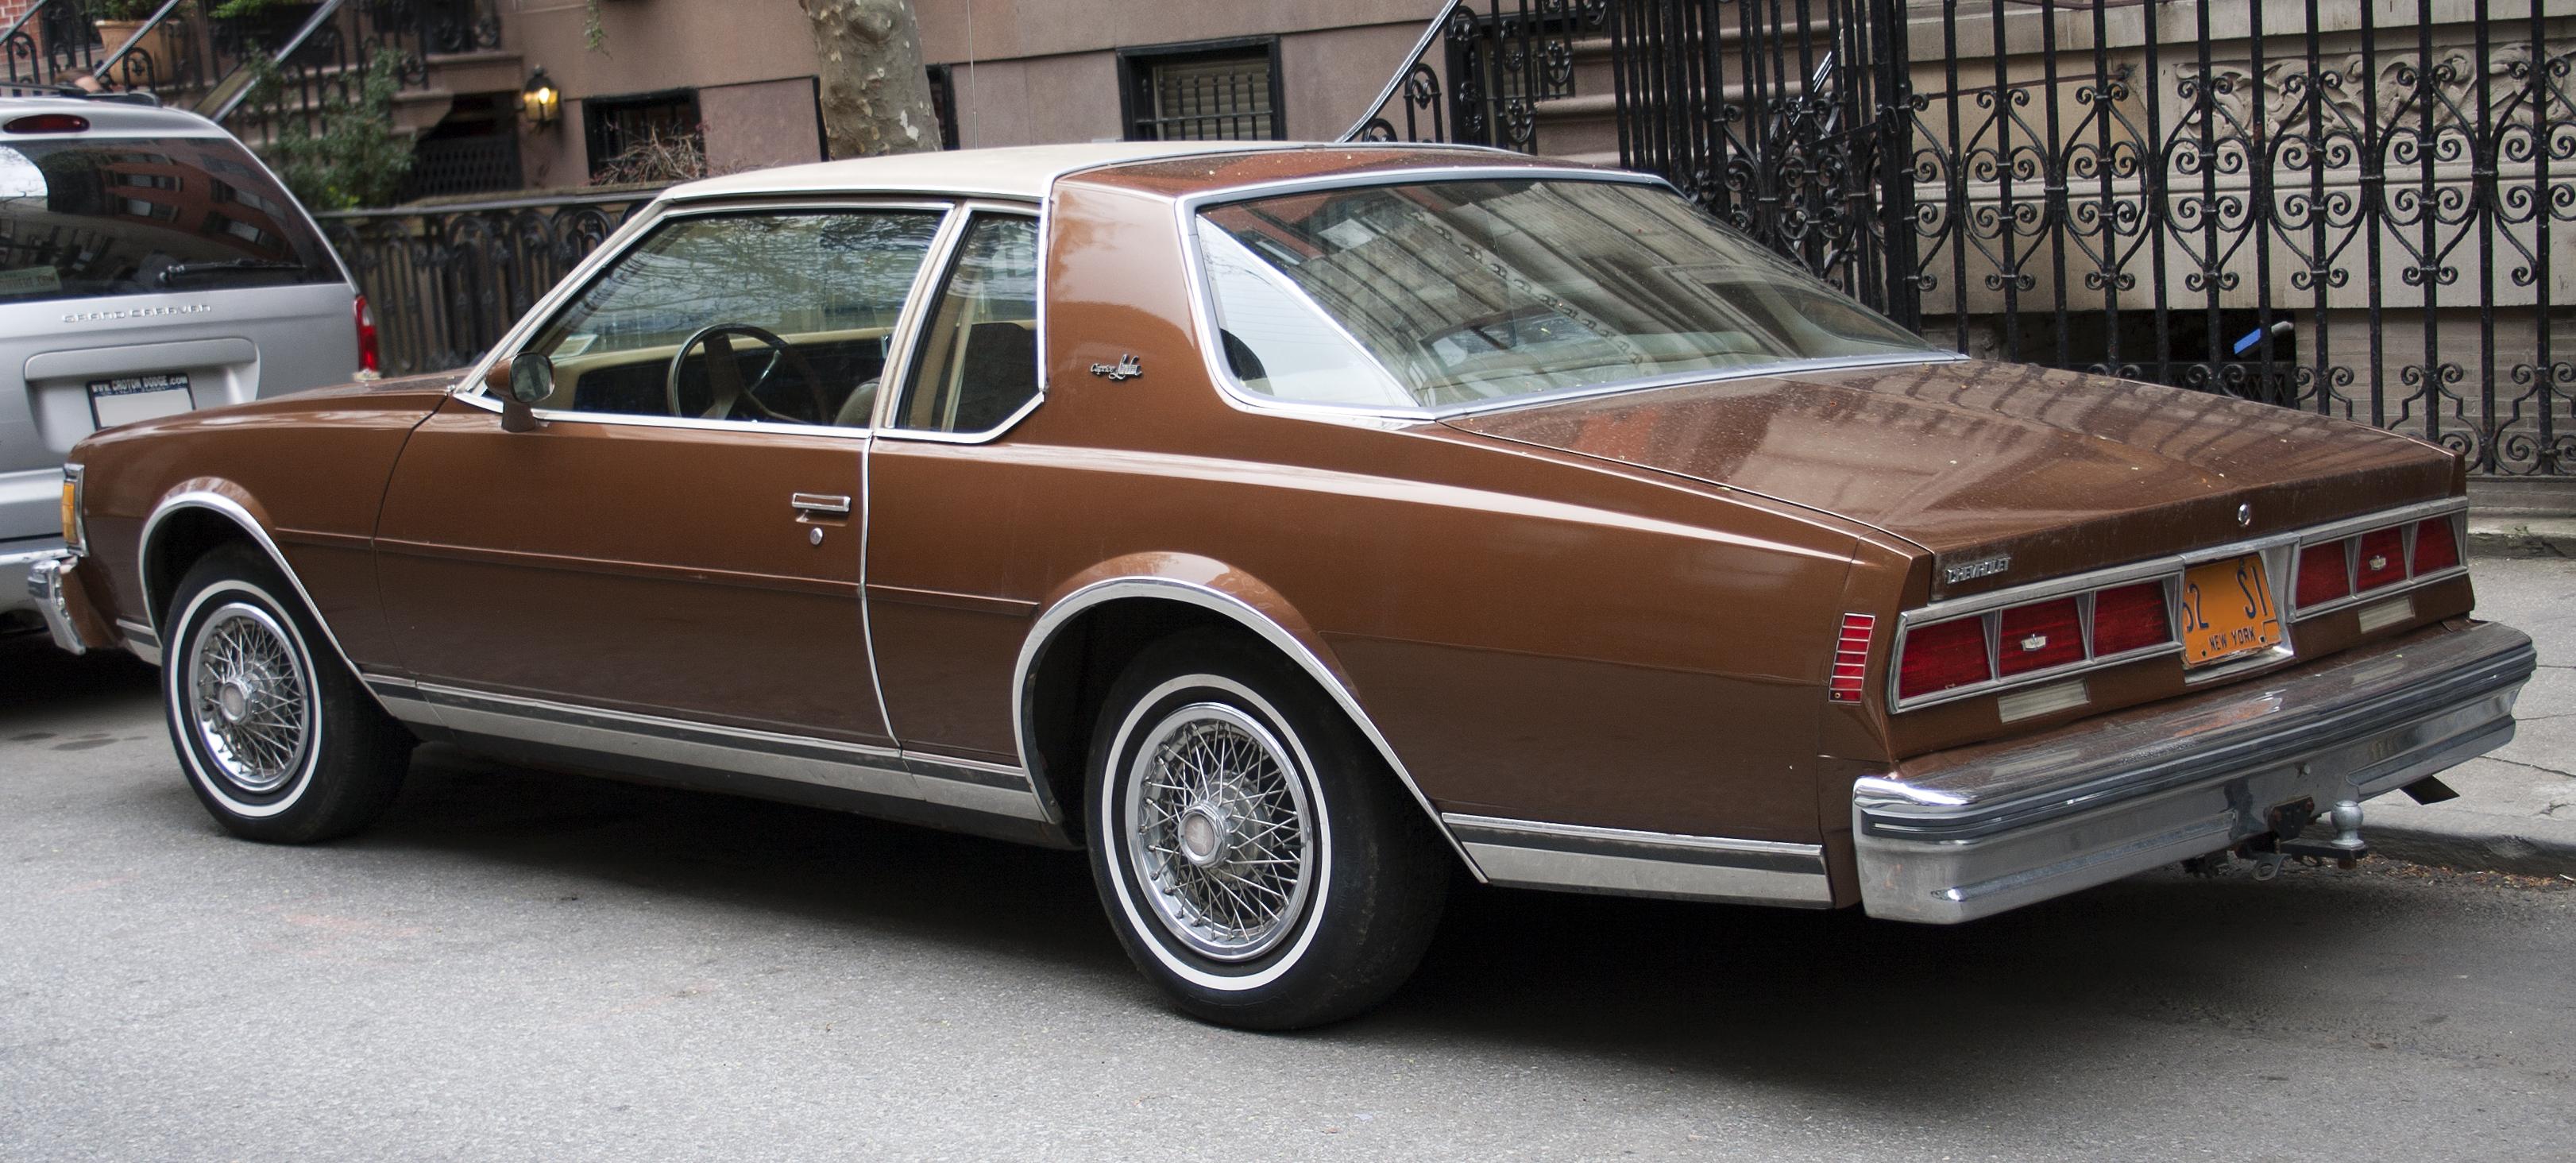 Chevrolet Caprice 1978 foto - 5